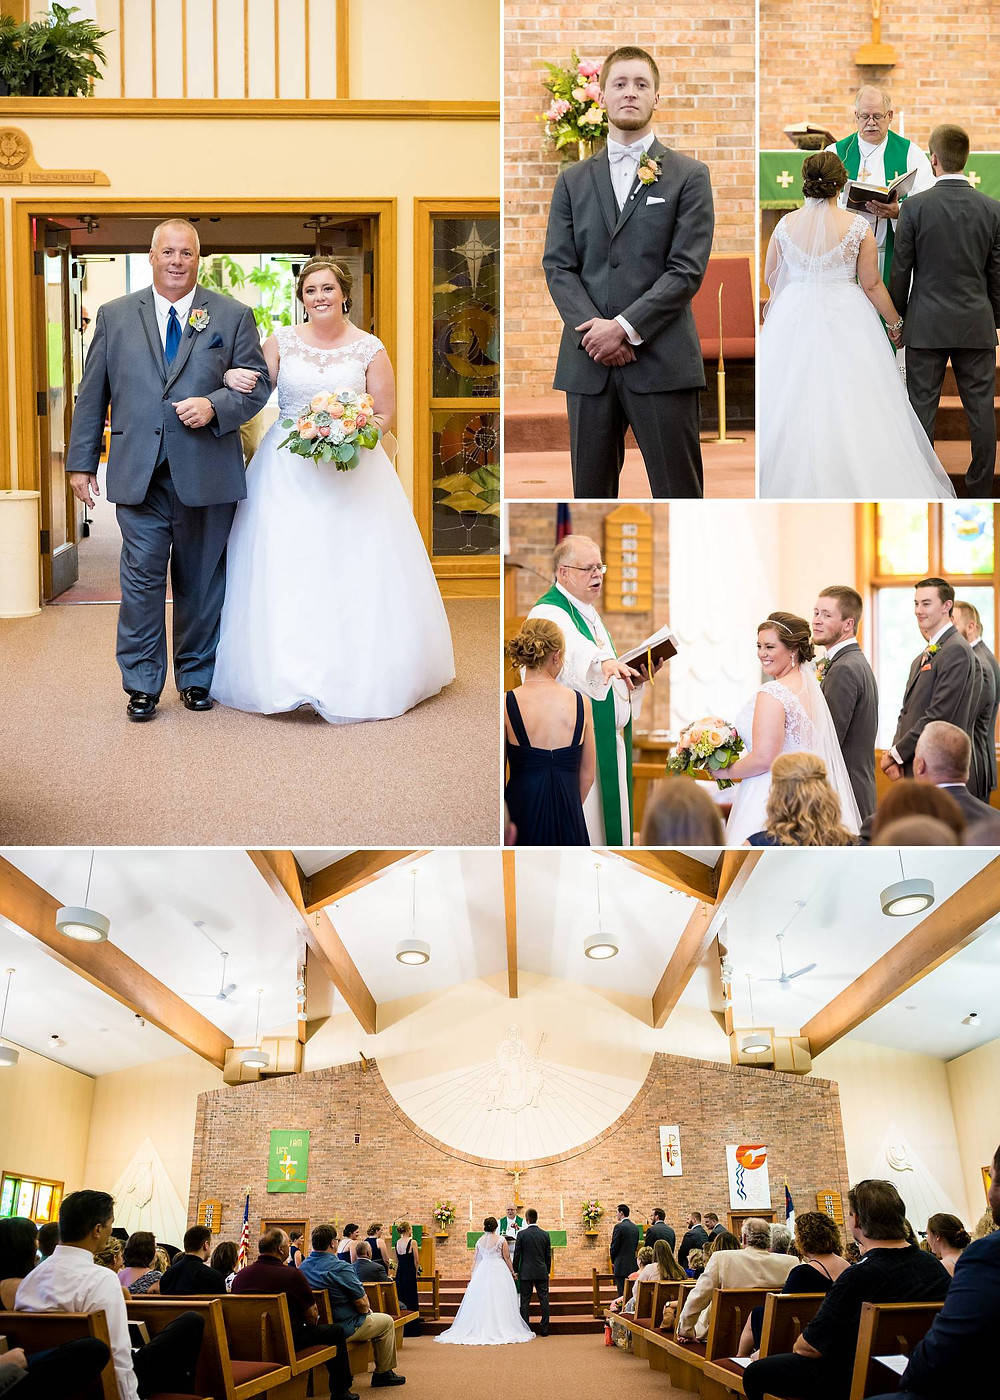 Oshkosh Wisconsin Summer Wedding Ceremony   Lanari Photography